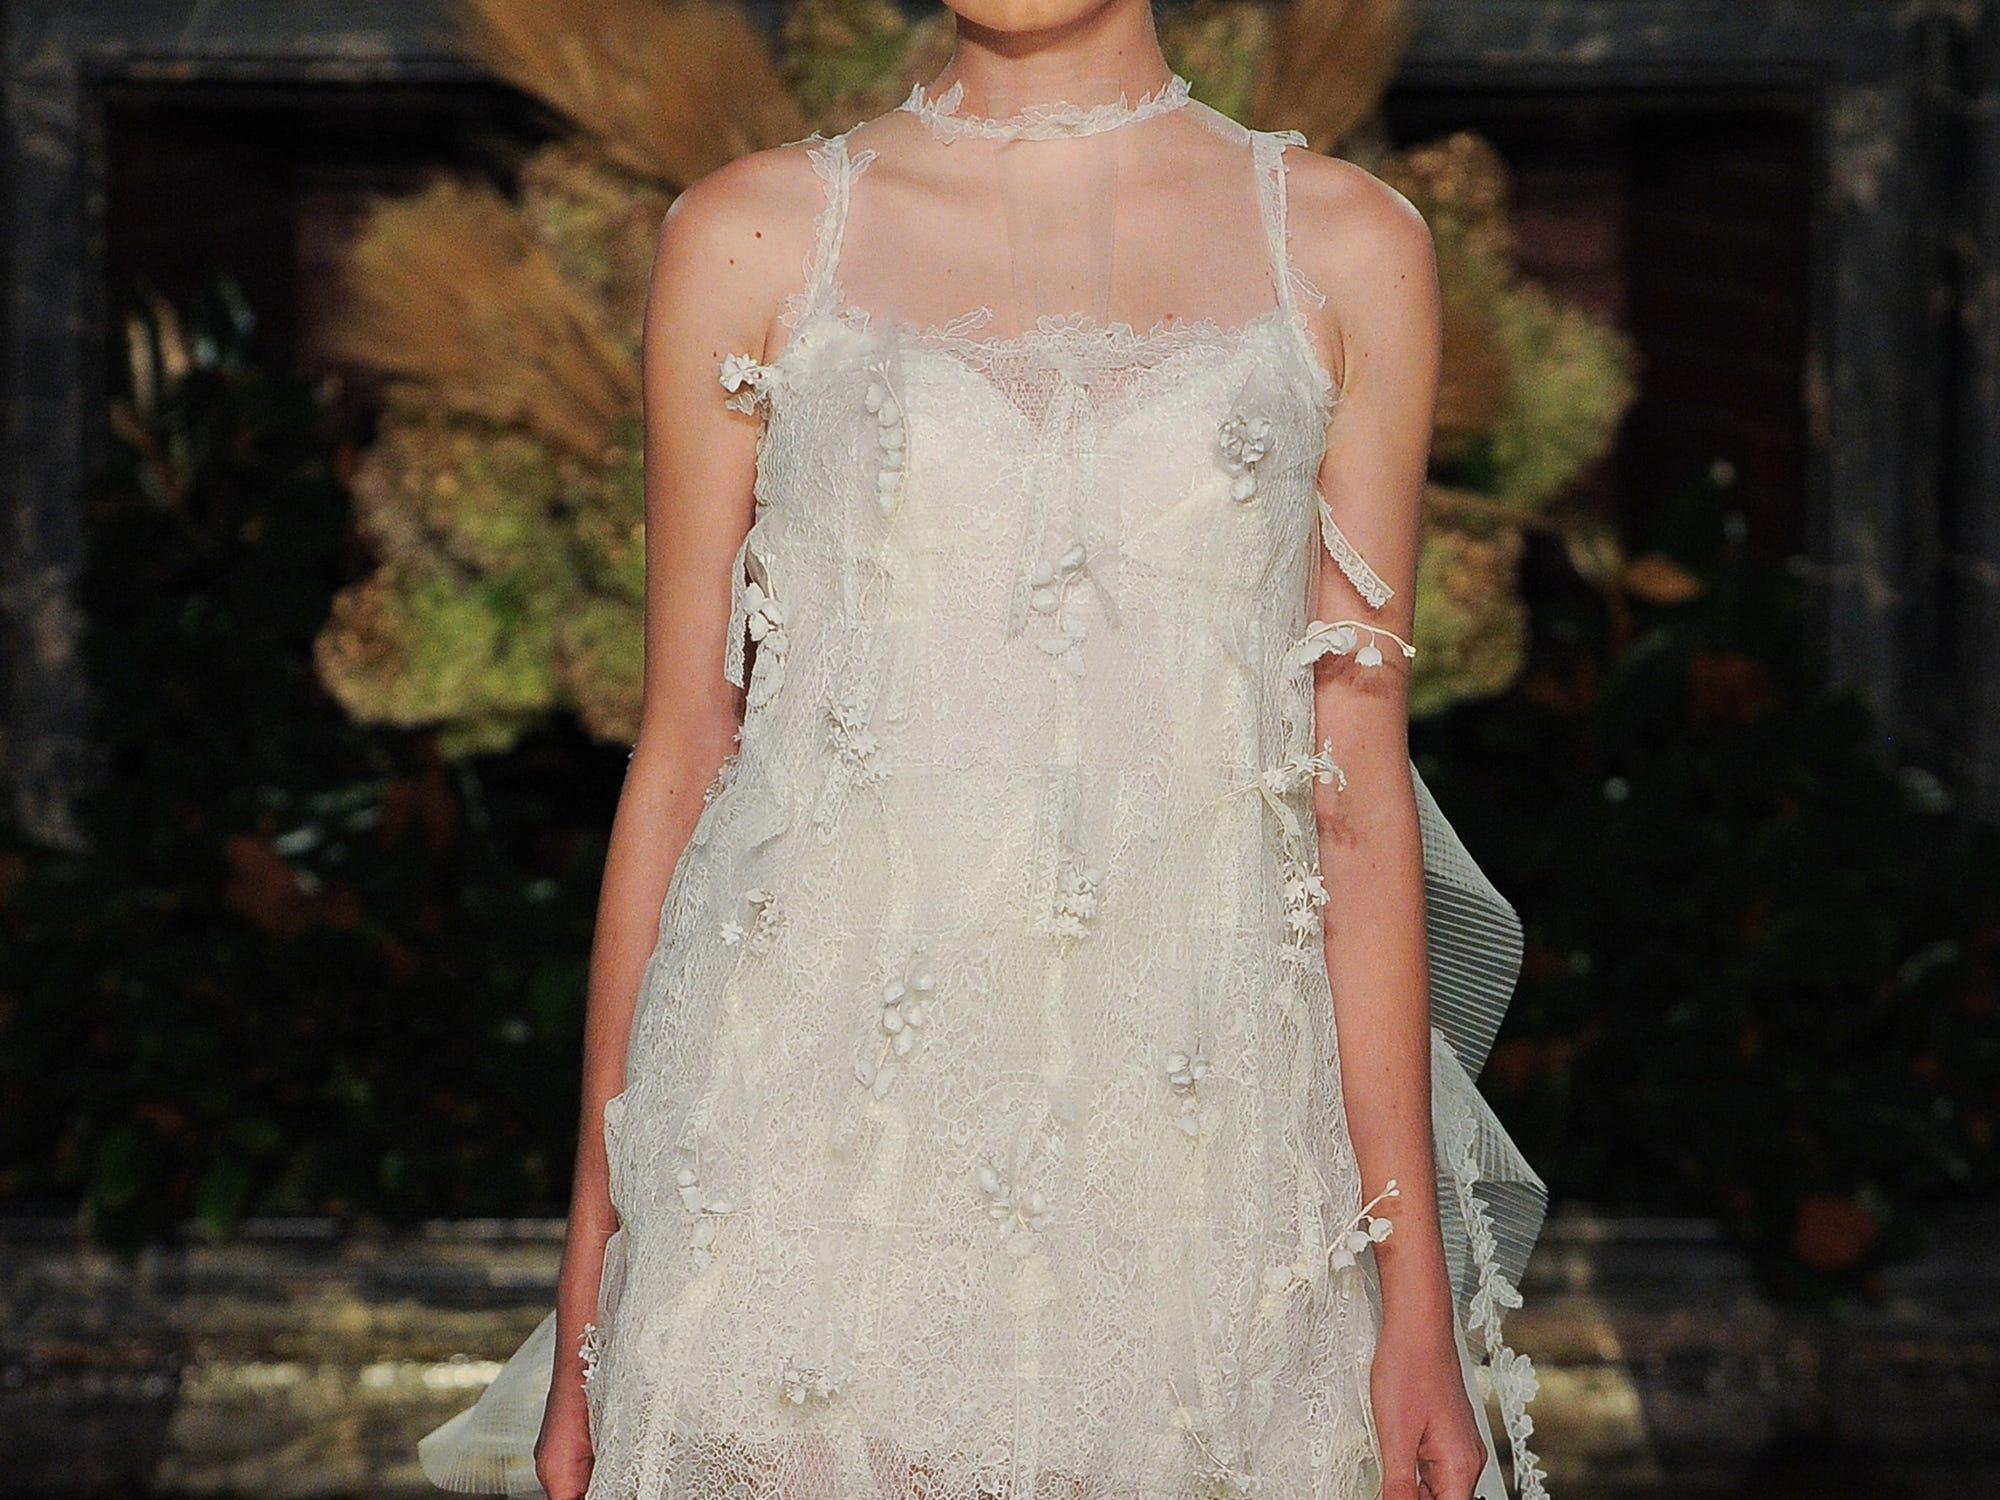 Wedding Dresses New Trends - Ruffles Pearls Bows